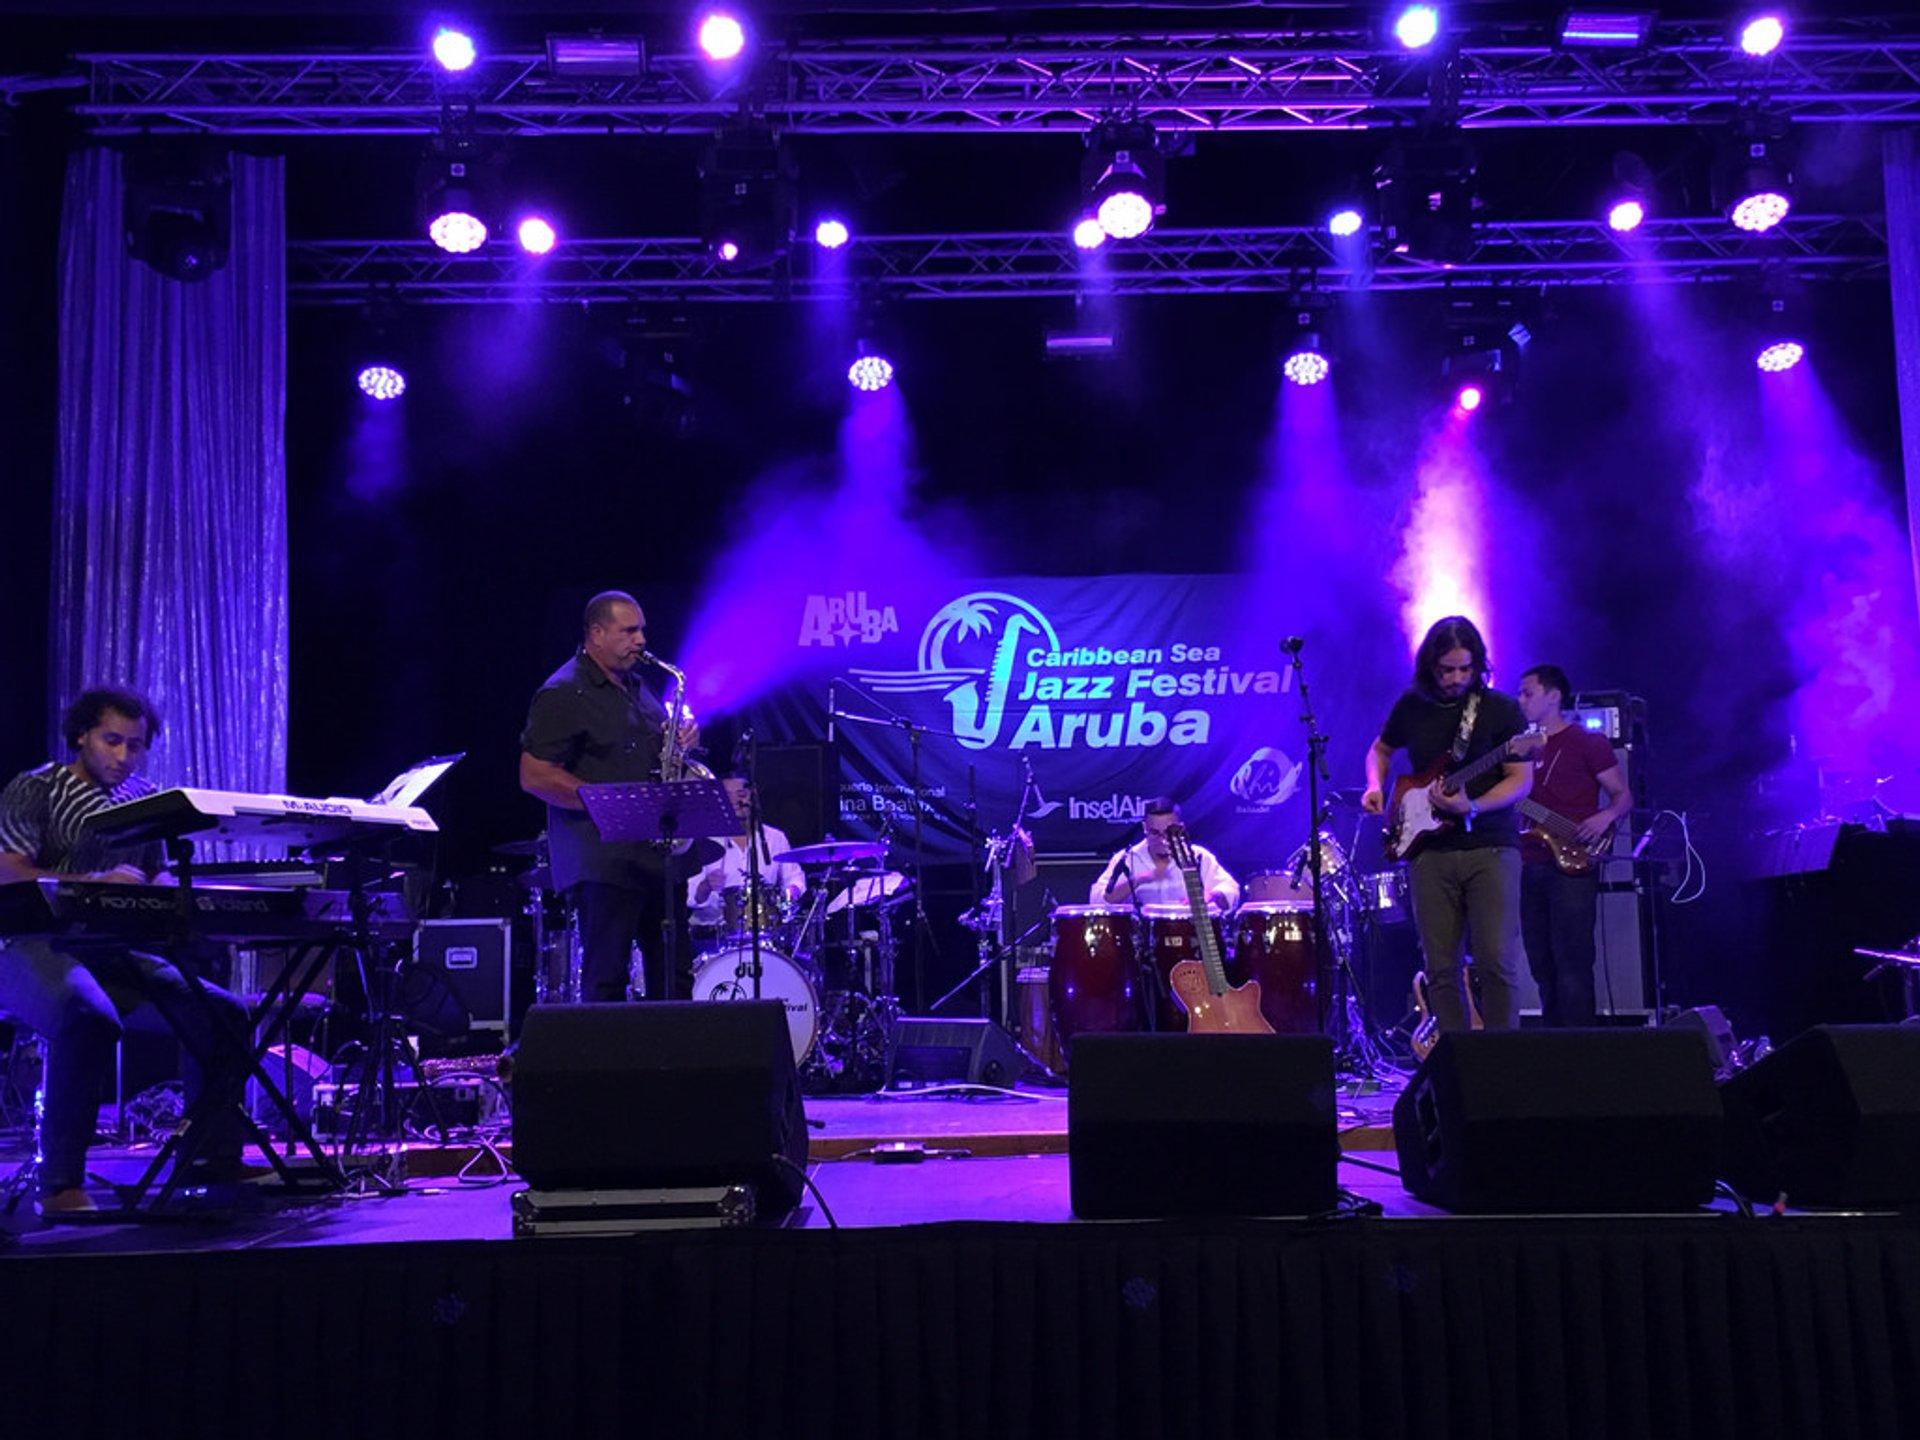 Caribbean Sea Jazz Festival in Aruba 2020 - Best Time